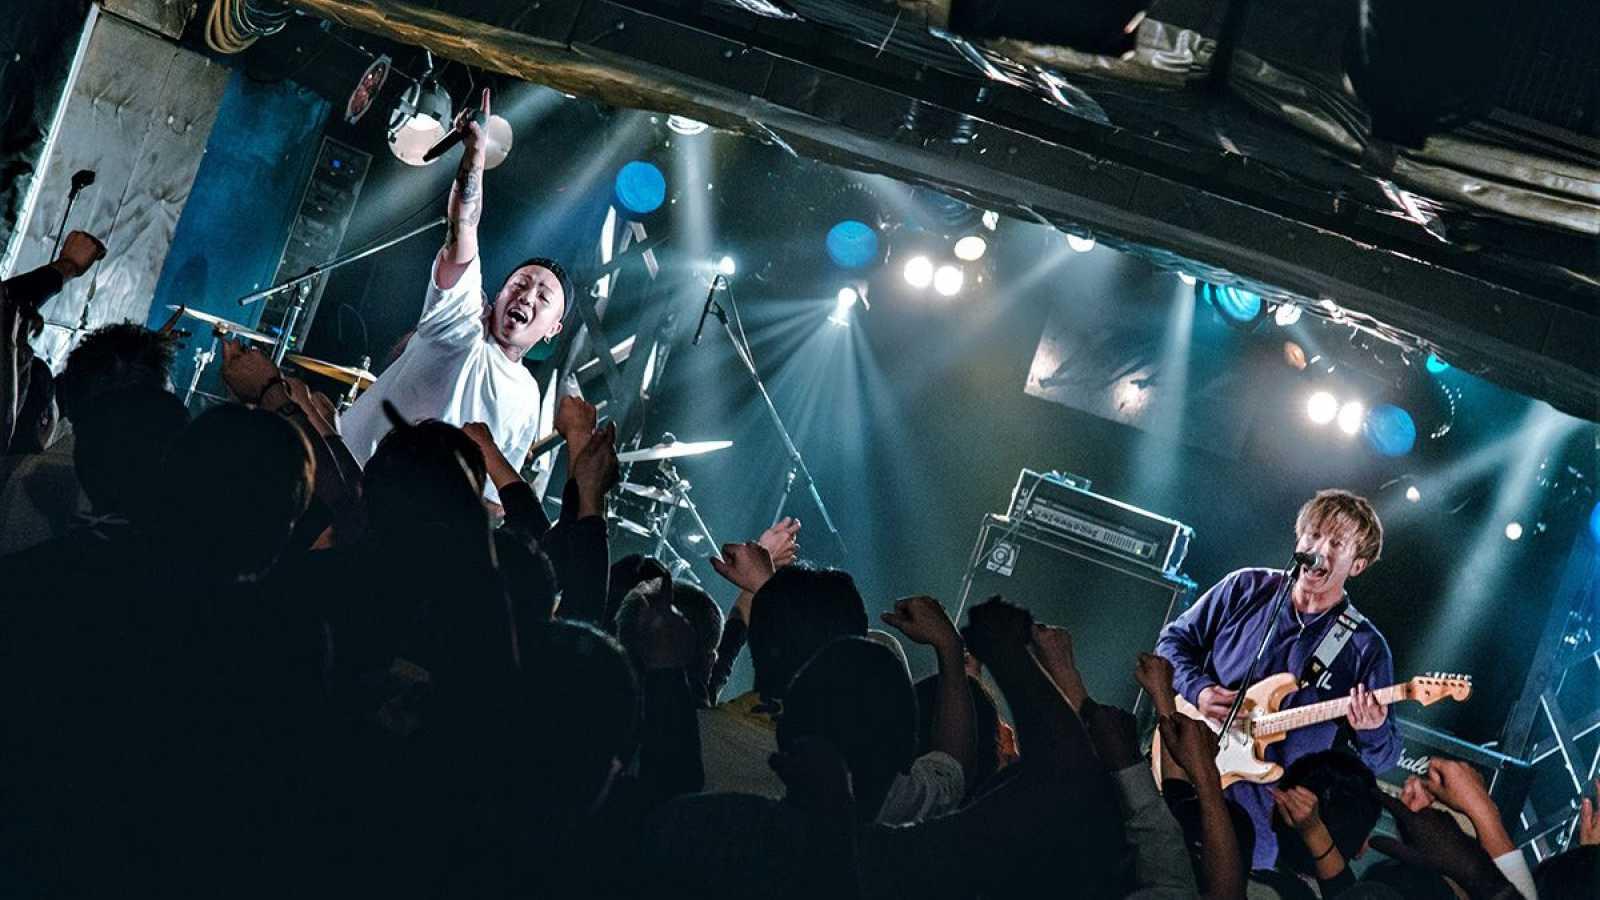 Neues digitales Mini-Album von BACK-ON © BACK-ON. Provided by Resonance Media.